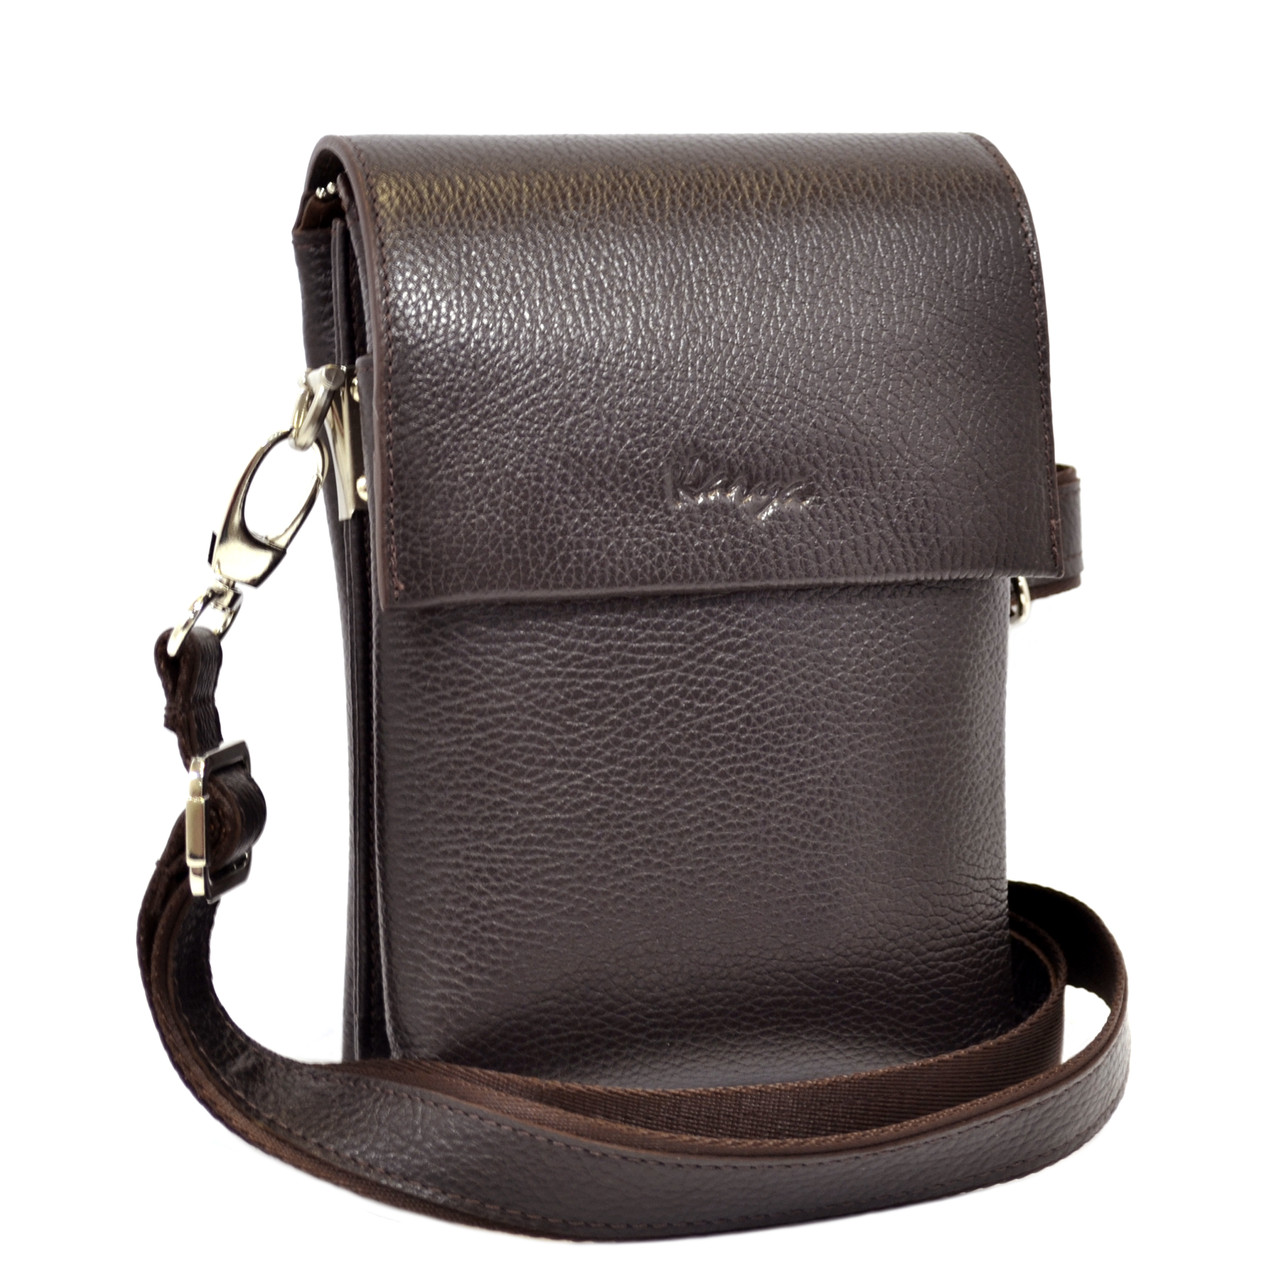 66a2d8029ee5 Кожаная мужская сумка через плечо Karya - Интернет-магазин